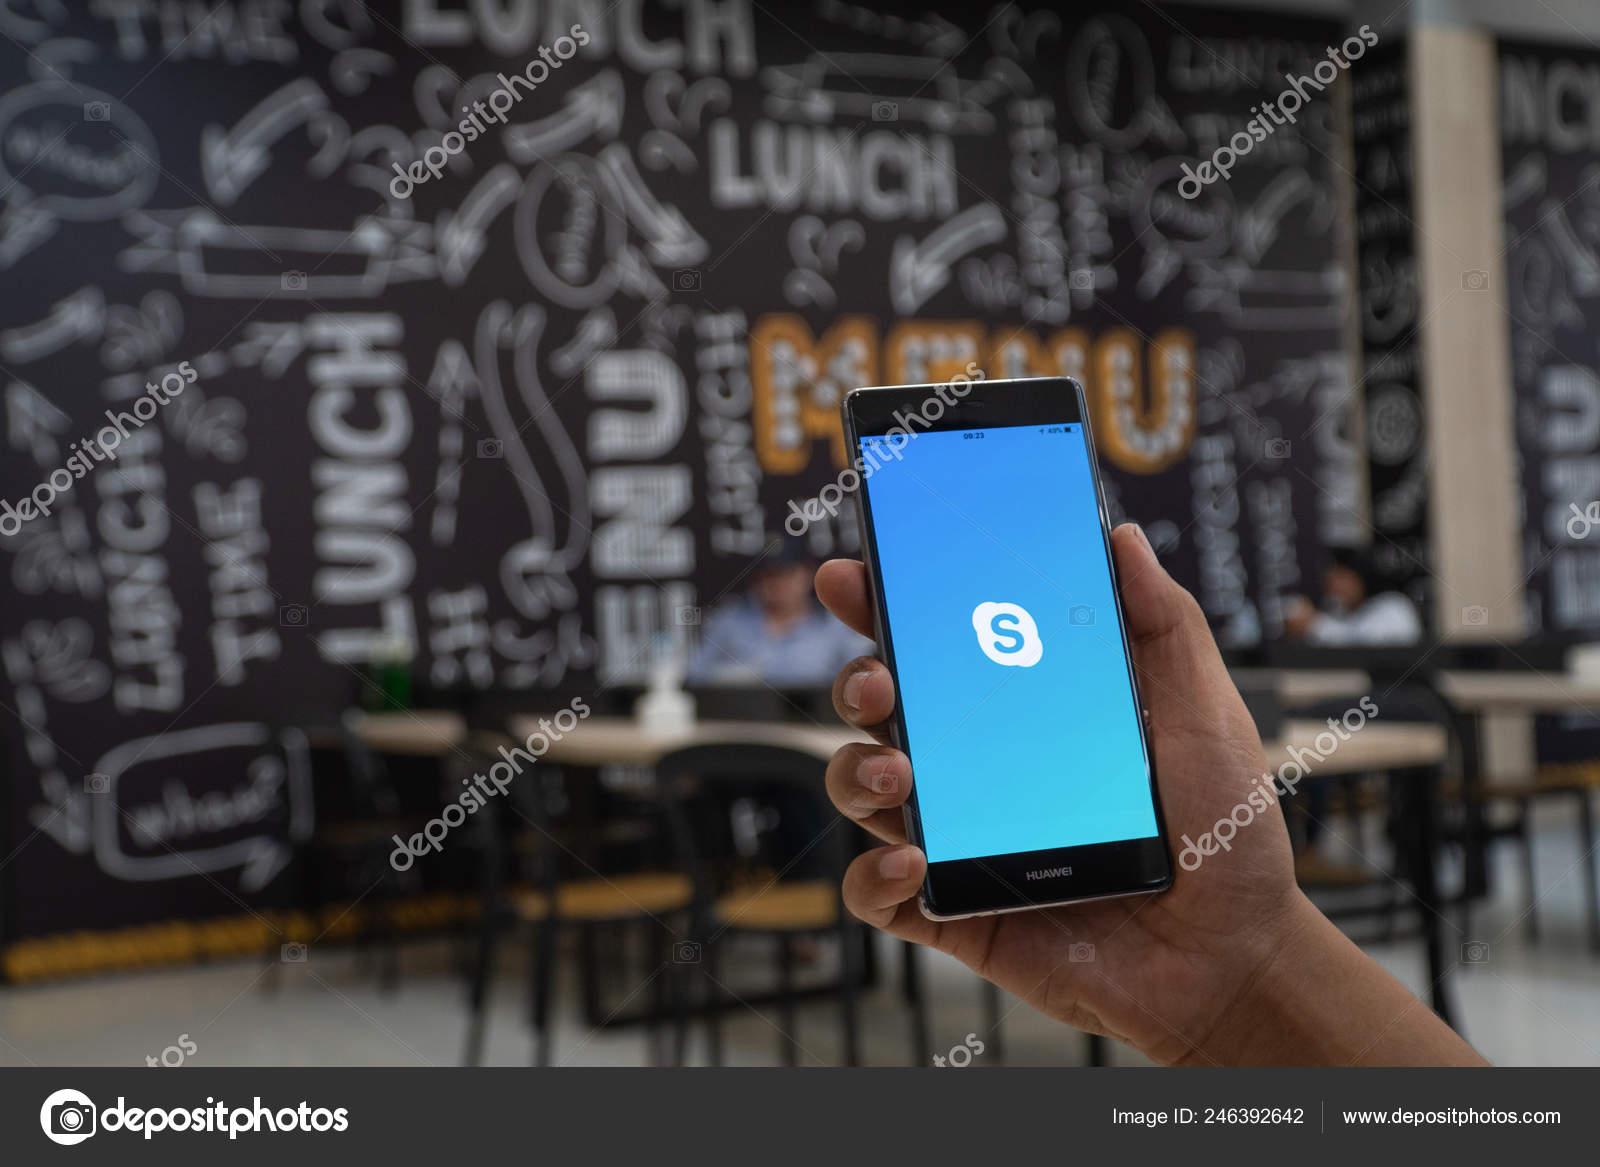 Chiang Mai Thailand Jan 2019 Man Holding Huawei Skype Apps – Stock